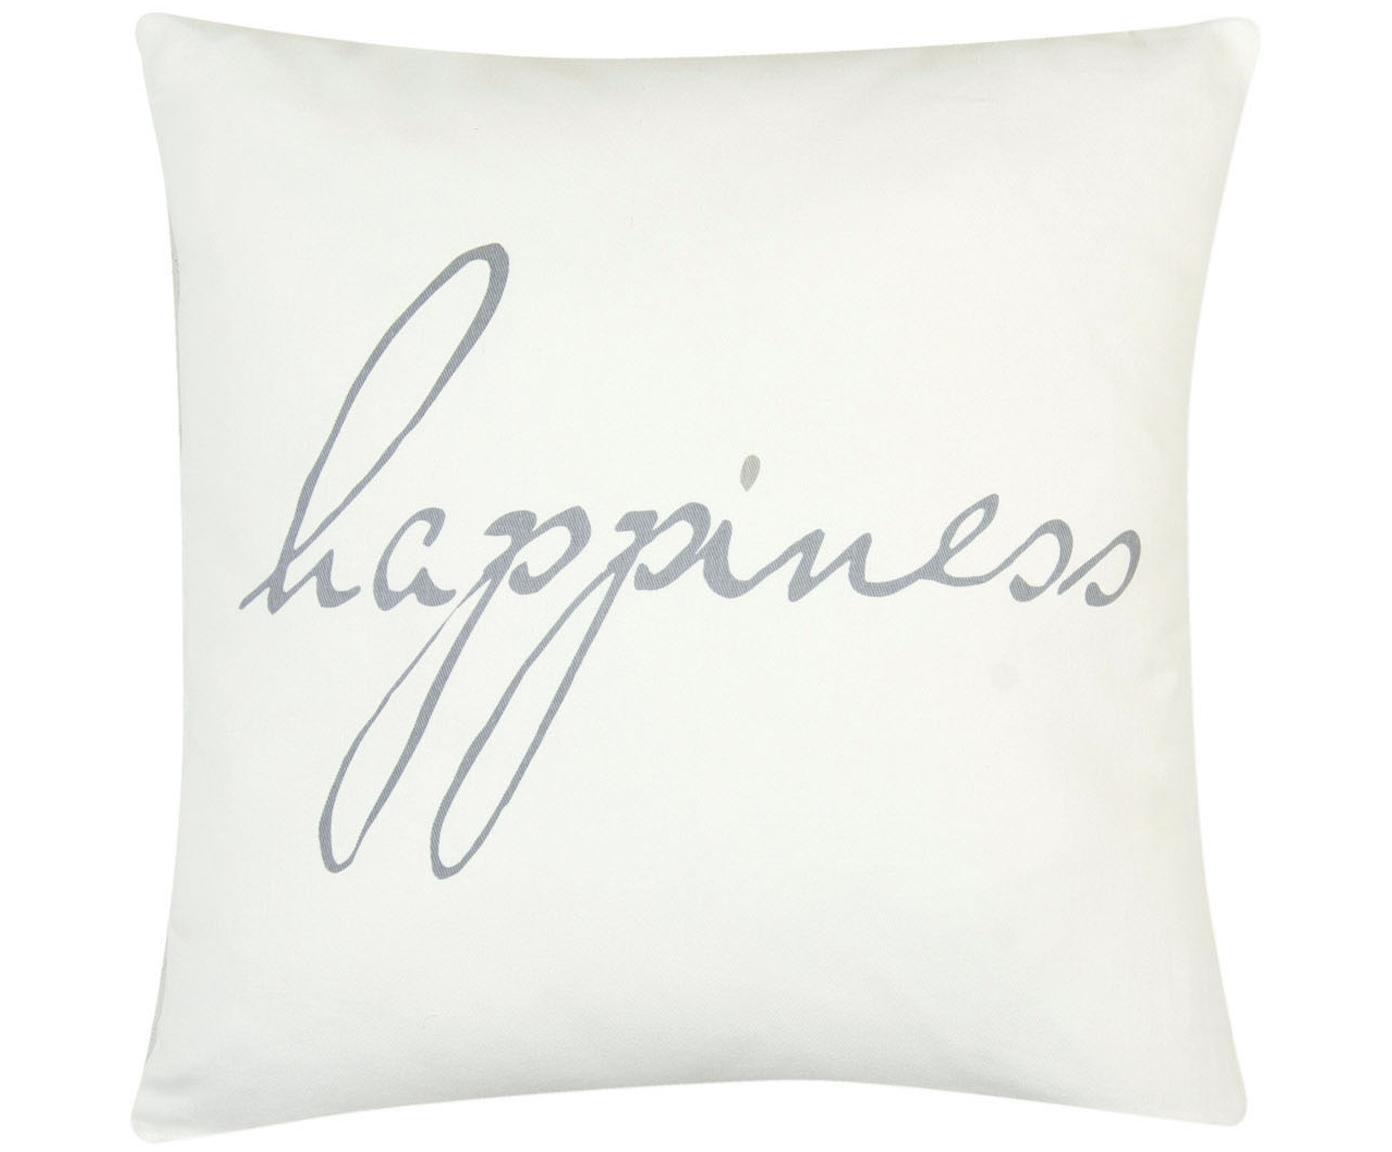 Kissenhülle Happiness mit Schriftzug, 100% Baumwolle, Panamabindung, Grau, Creme, 40 x 40 cm